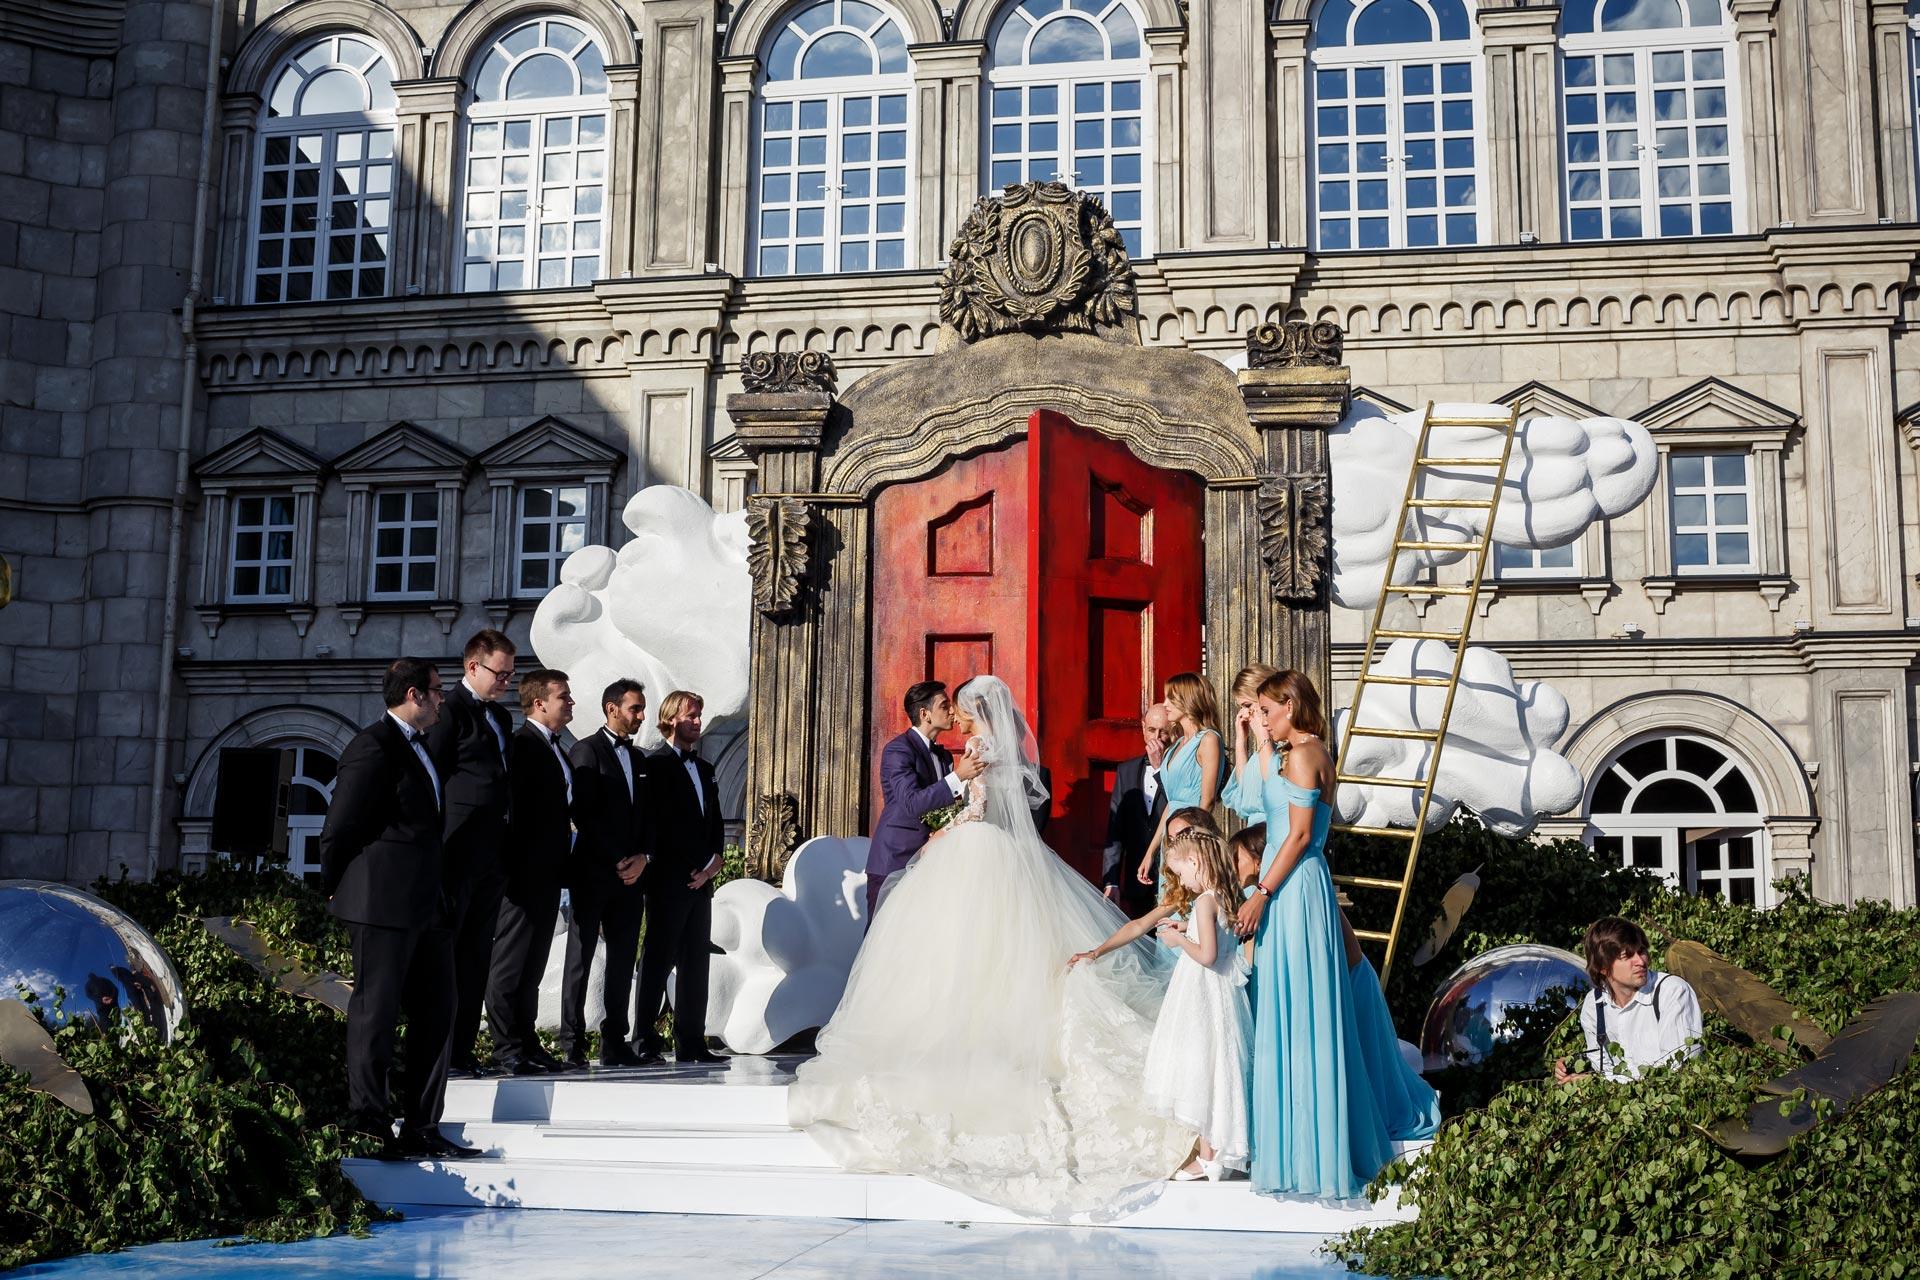 Follow me to. Свадьба Натальи и Мурада Османн фото 14